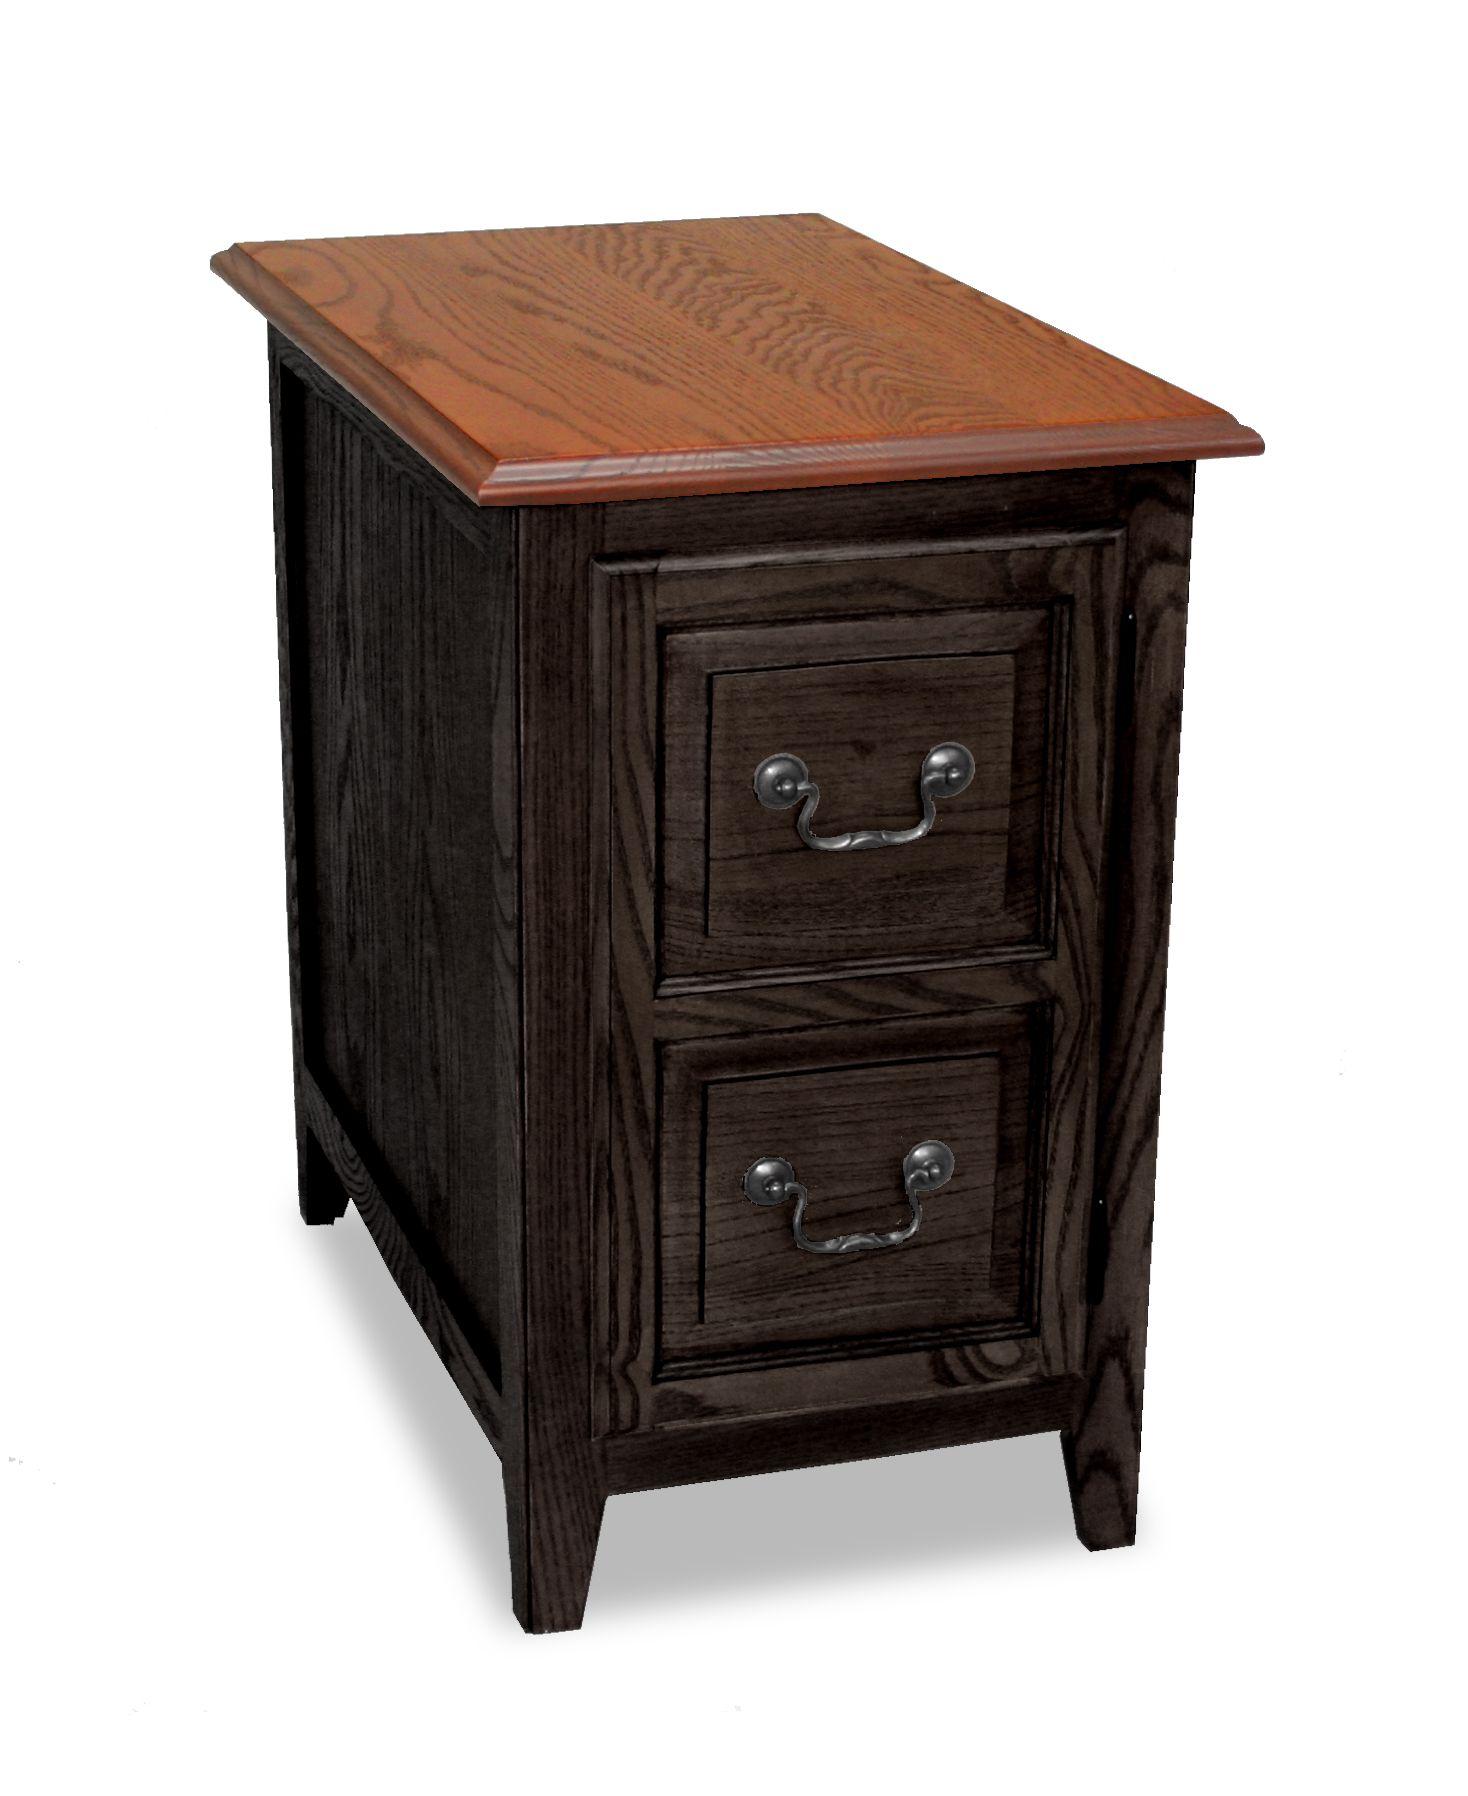 Leick Favorite Finds Shaker Storage End Table - Slate Black